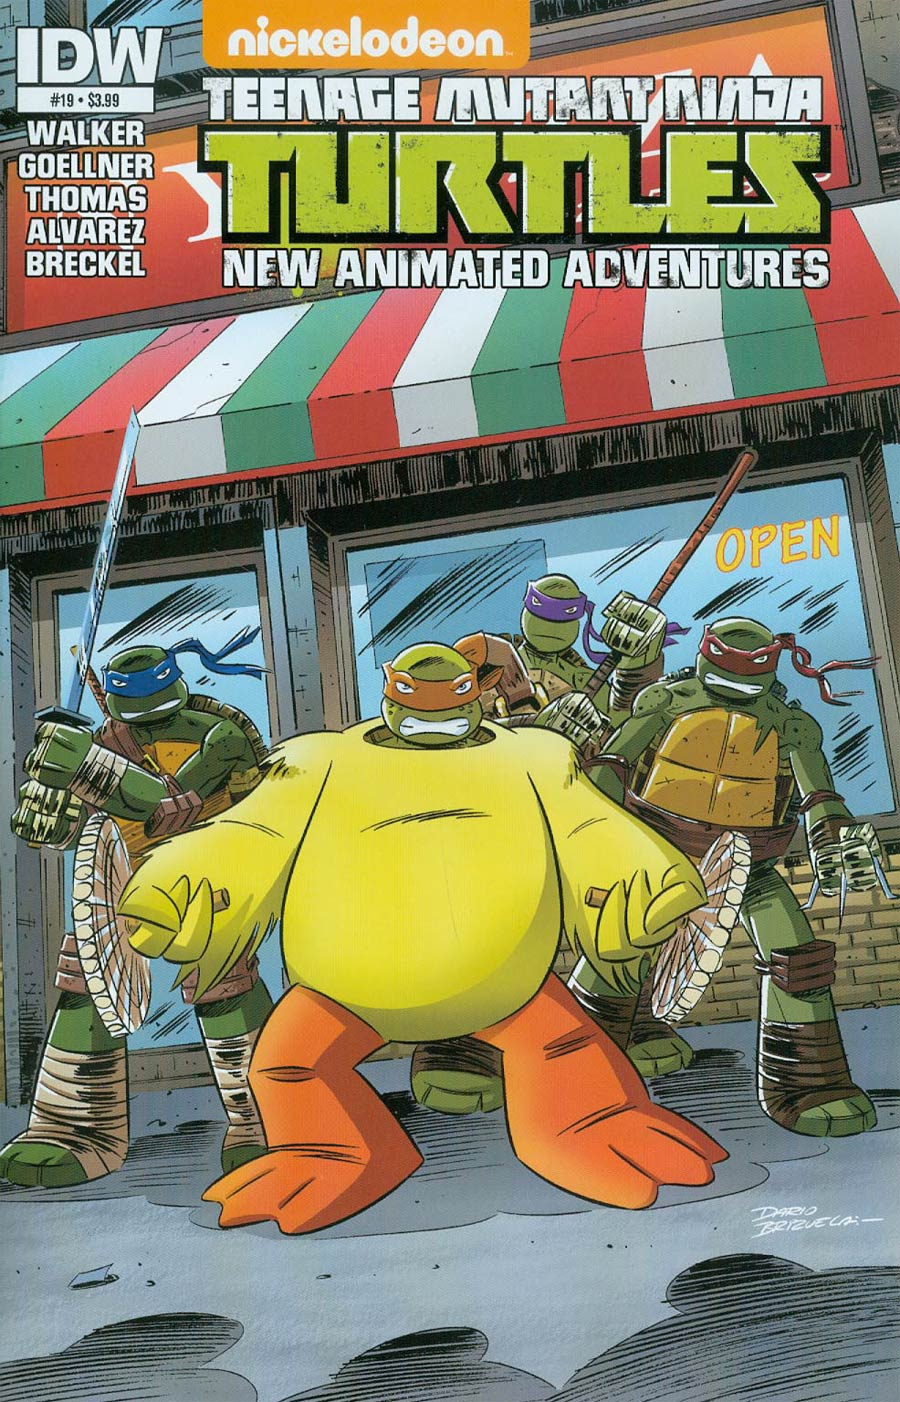 Teenage Mutant Ninja Turtles New Animated Adventures #19 Cover A Regular Dario Brizuela Cover